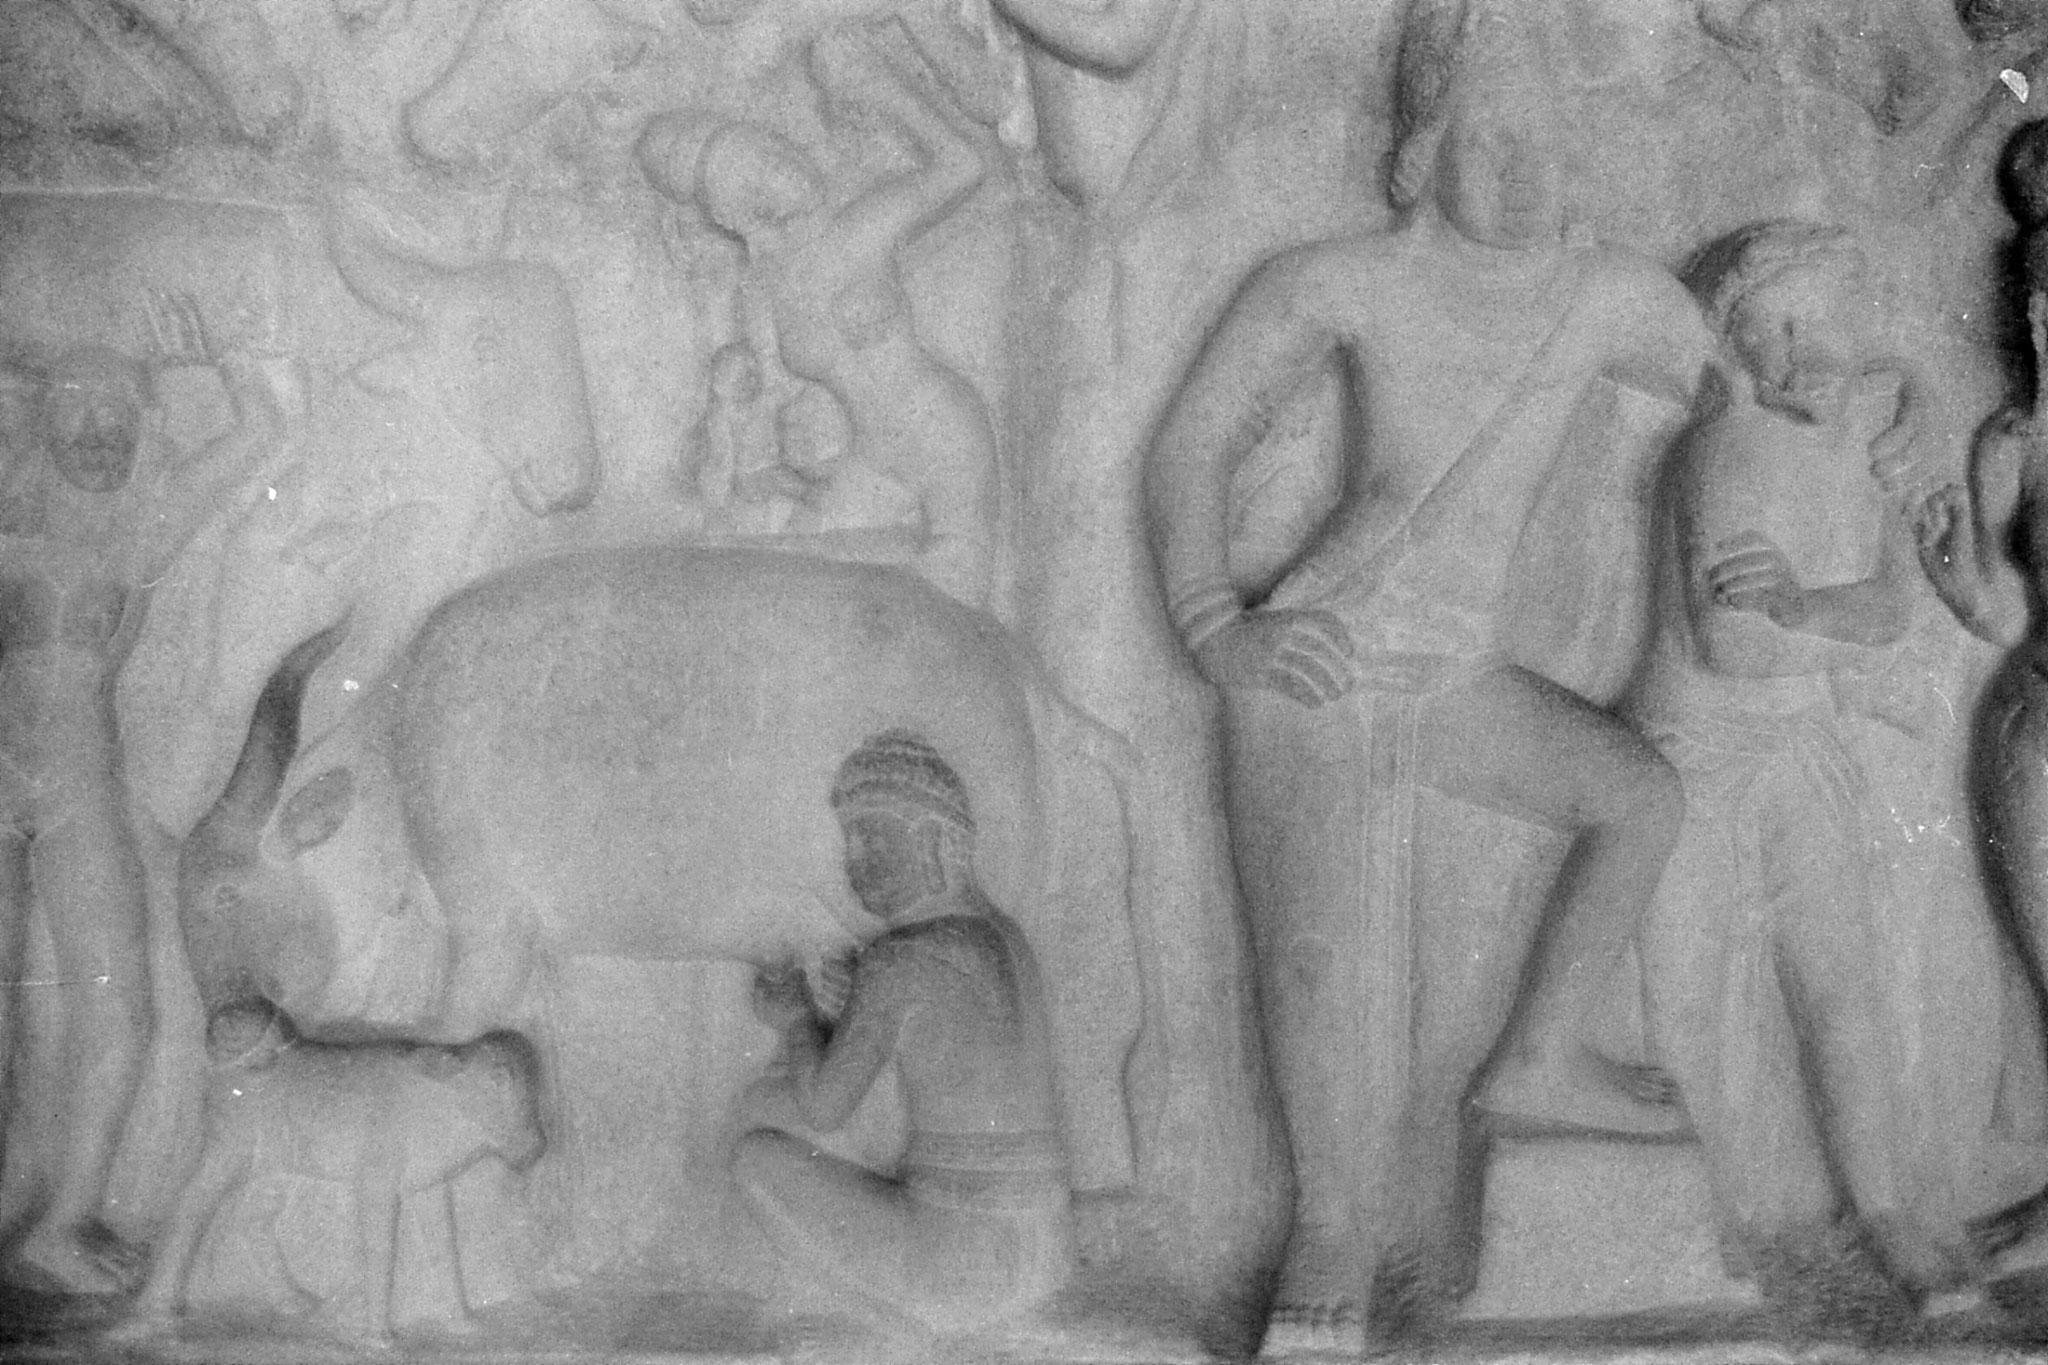 19/1/90: 26: Mahabalipuram - 7th century bas relief